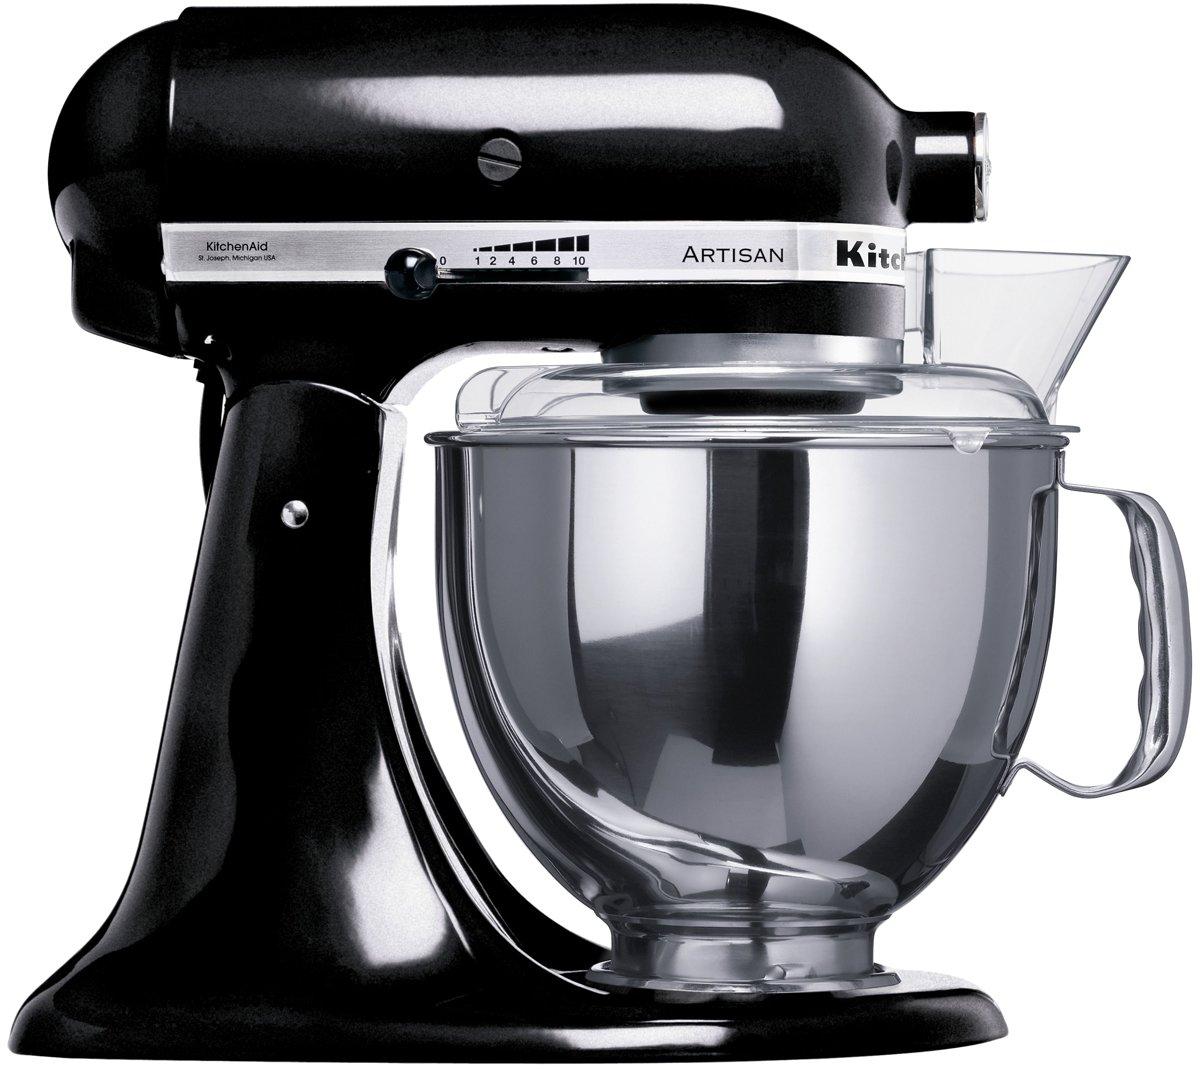 New Kitchenaid 91020 Artisan Ksm150 Stand Mixer